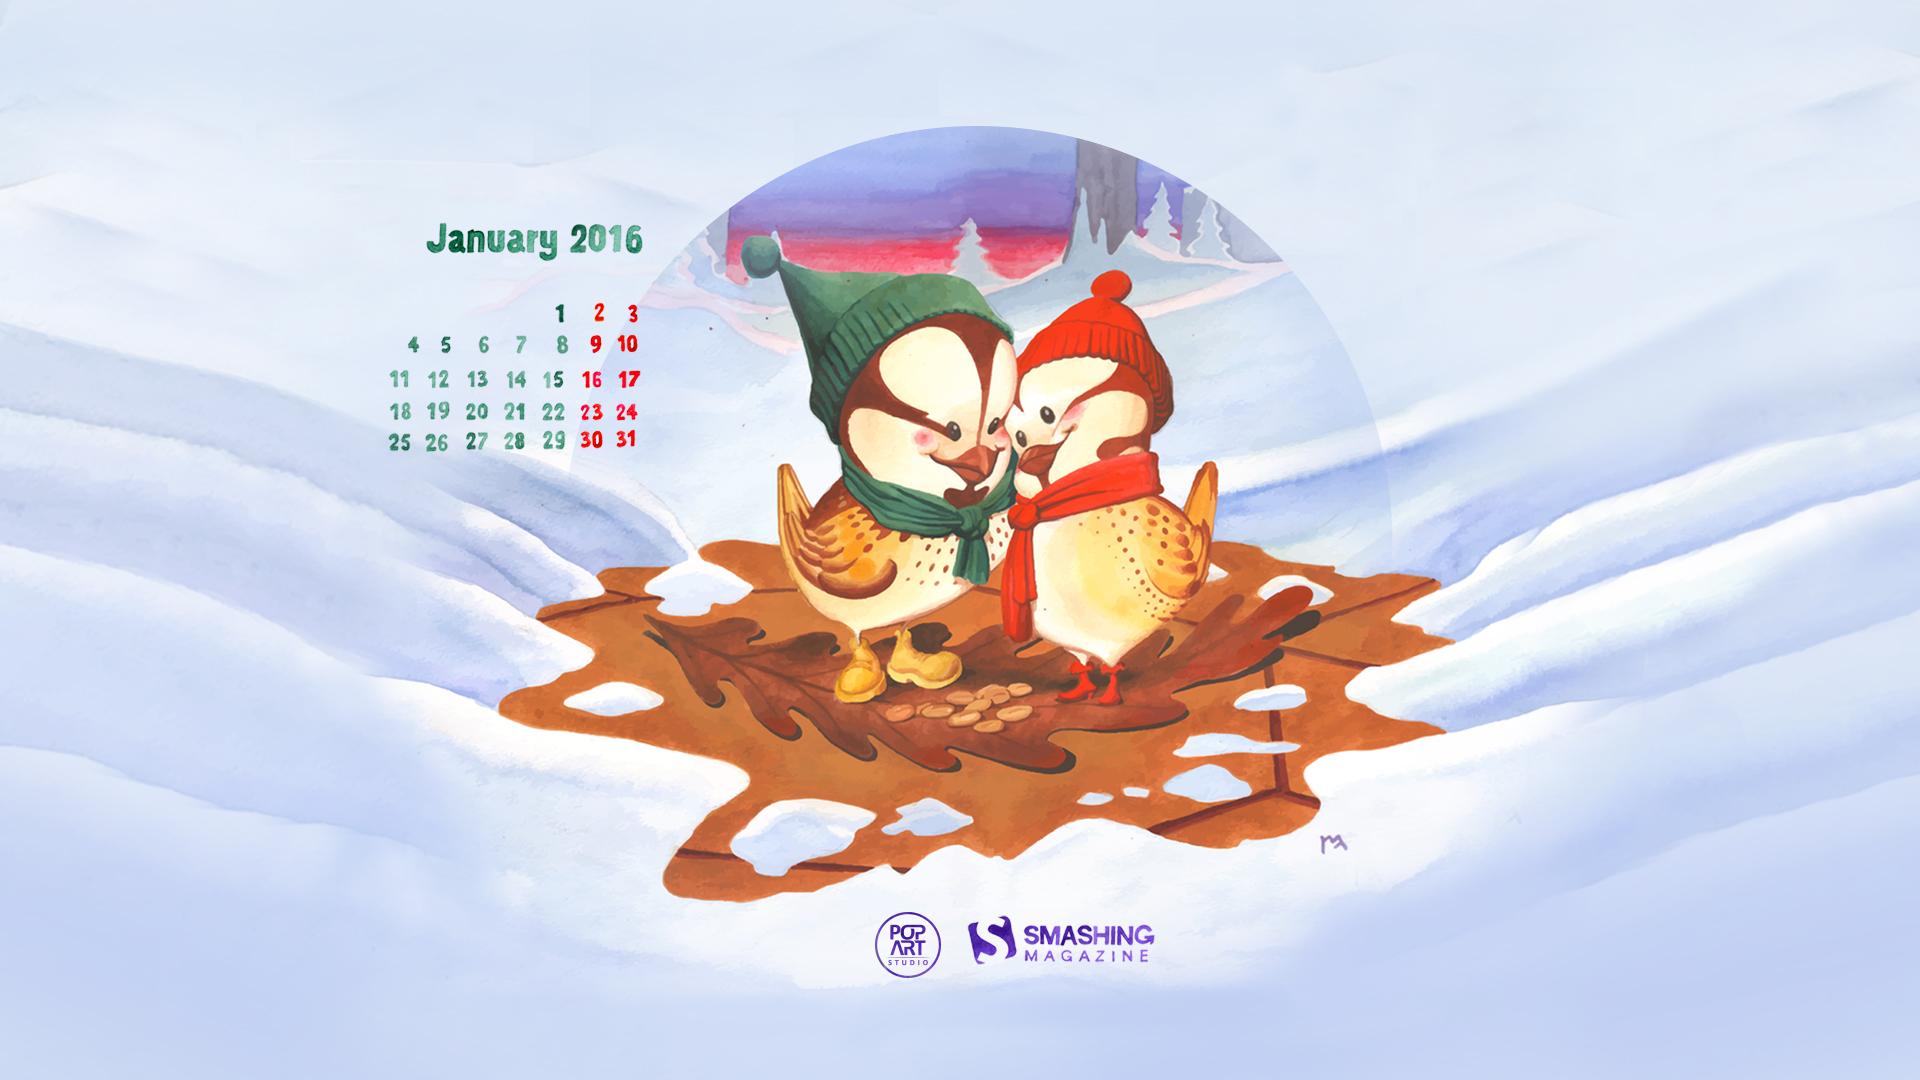 Beautiful January 2016 Calendars Wallpapers for Desktop and iPad 1920x1080